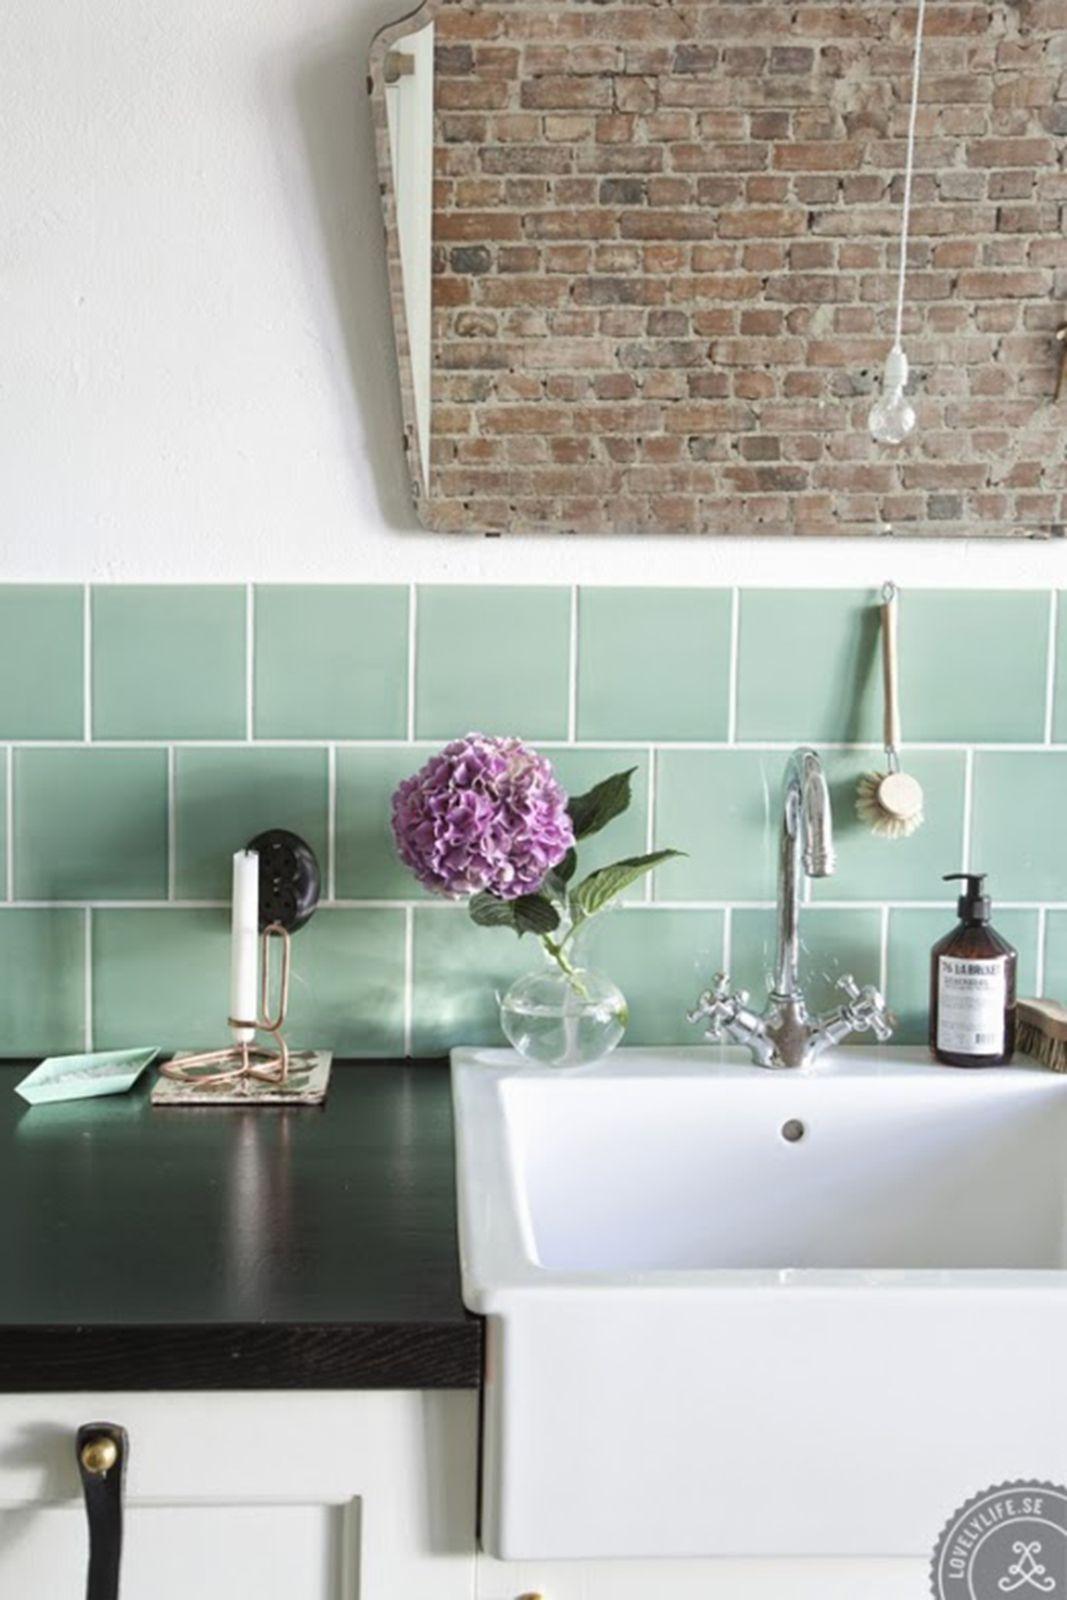 Stylish Bathroom Tiles | home is where you make it | Pinterest ...